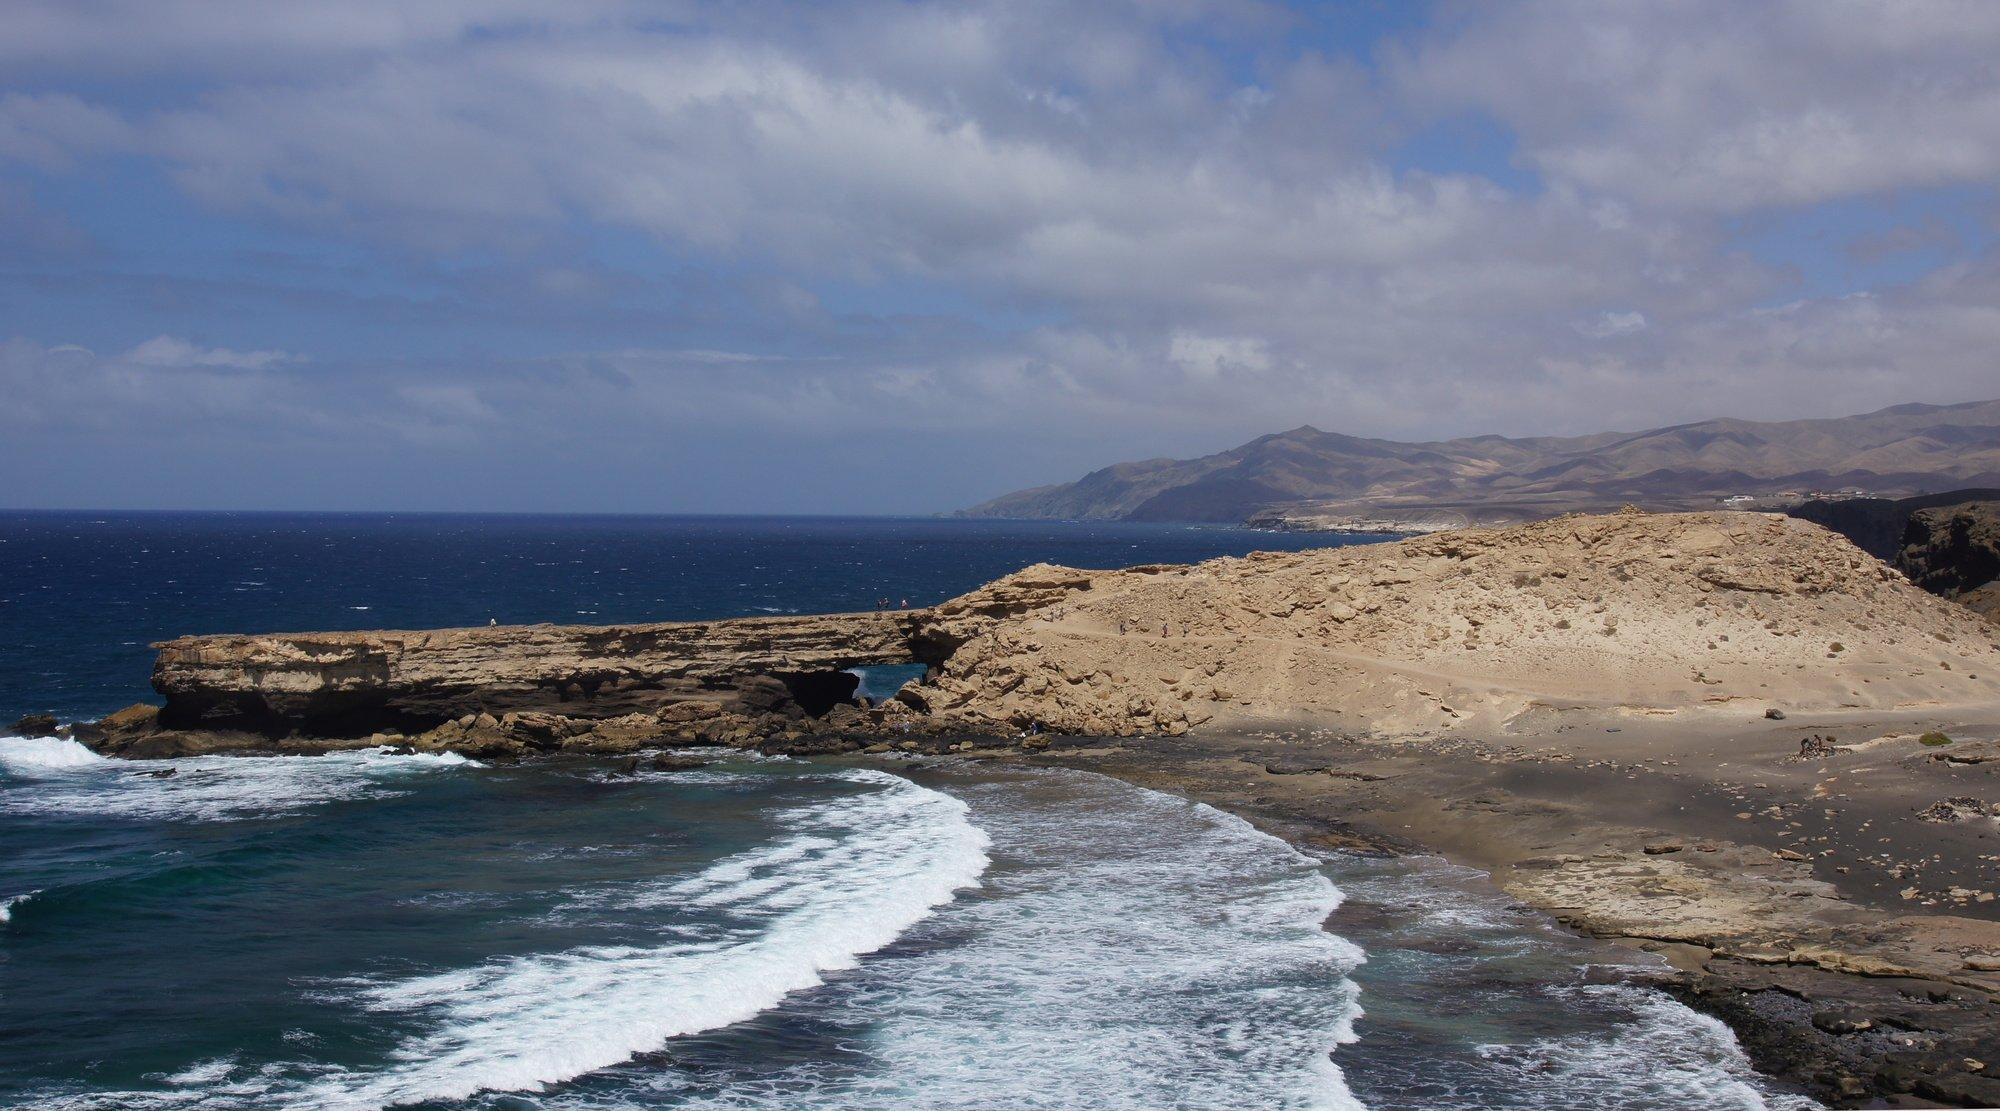 Playa La Pared